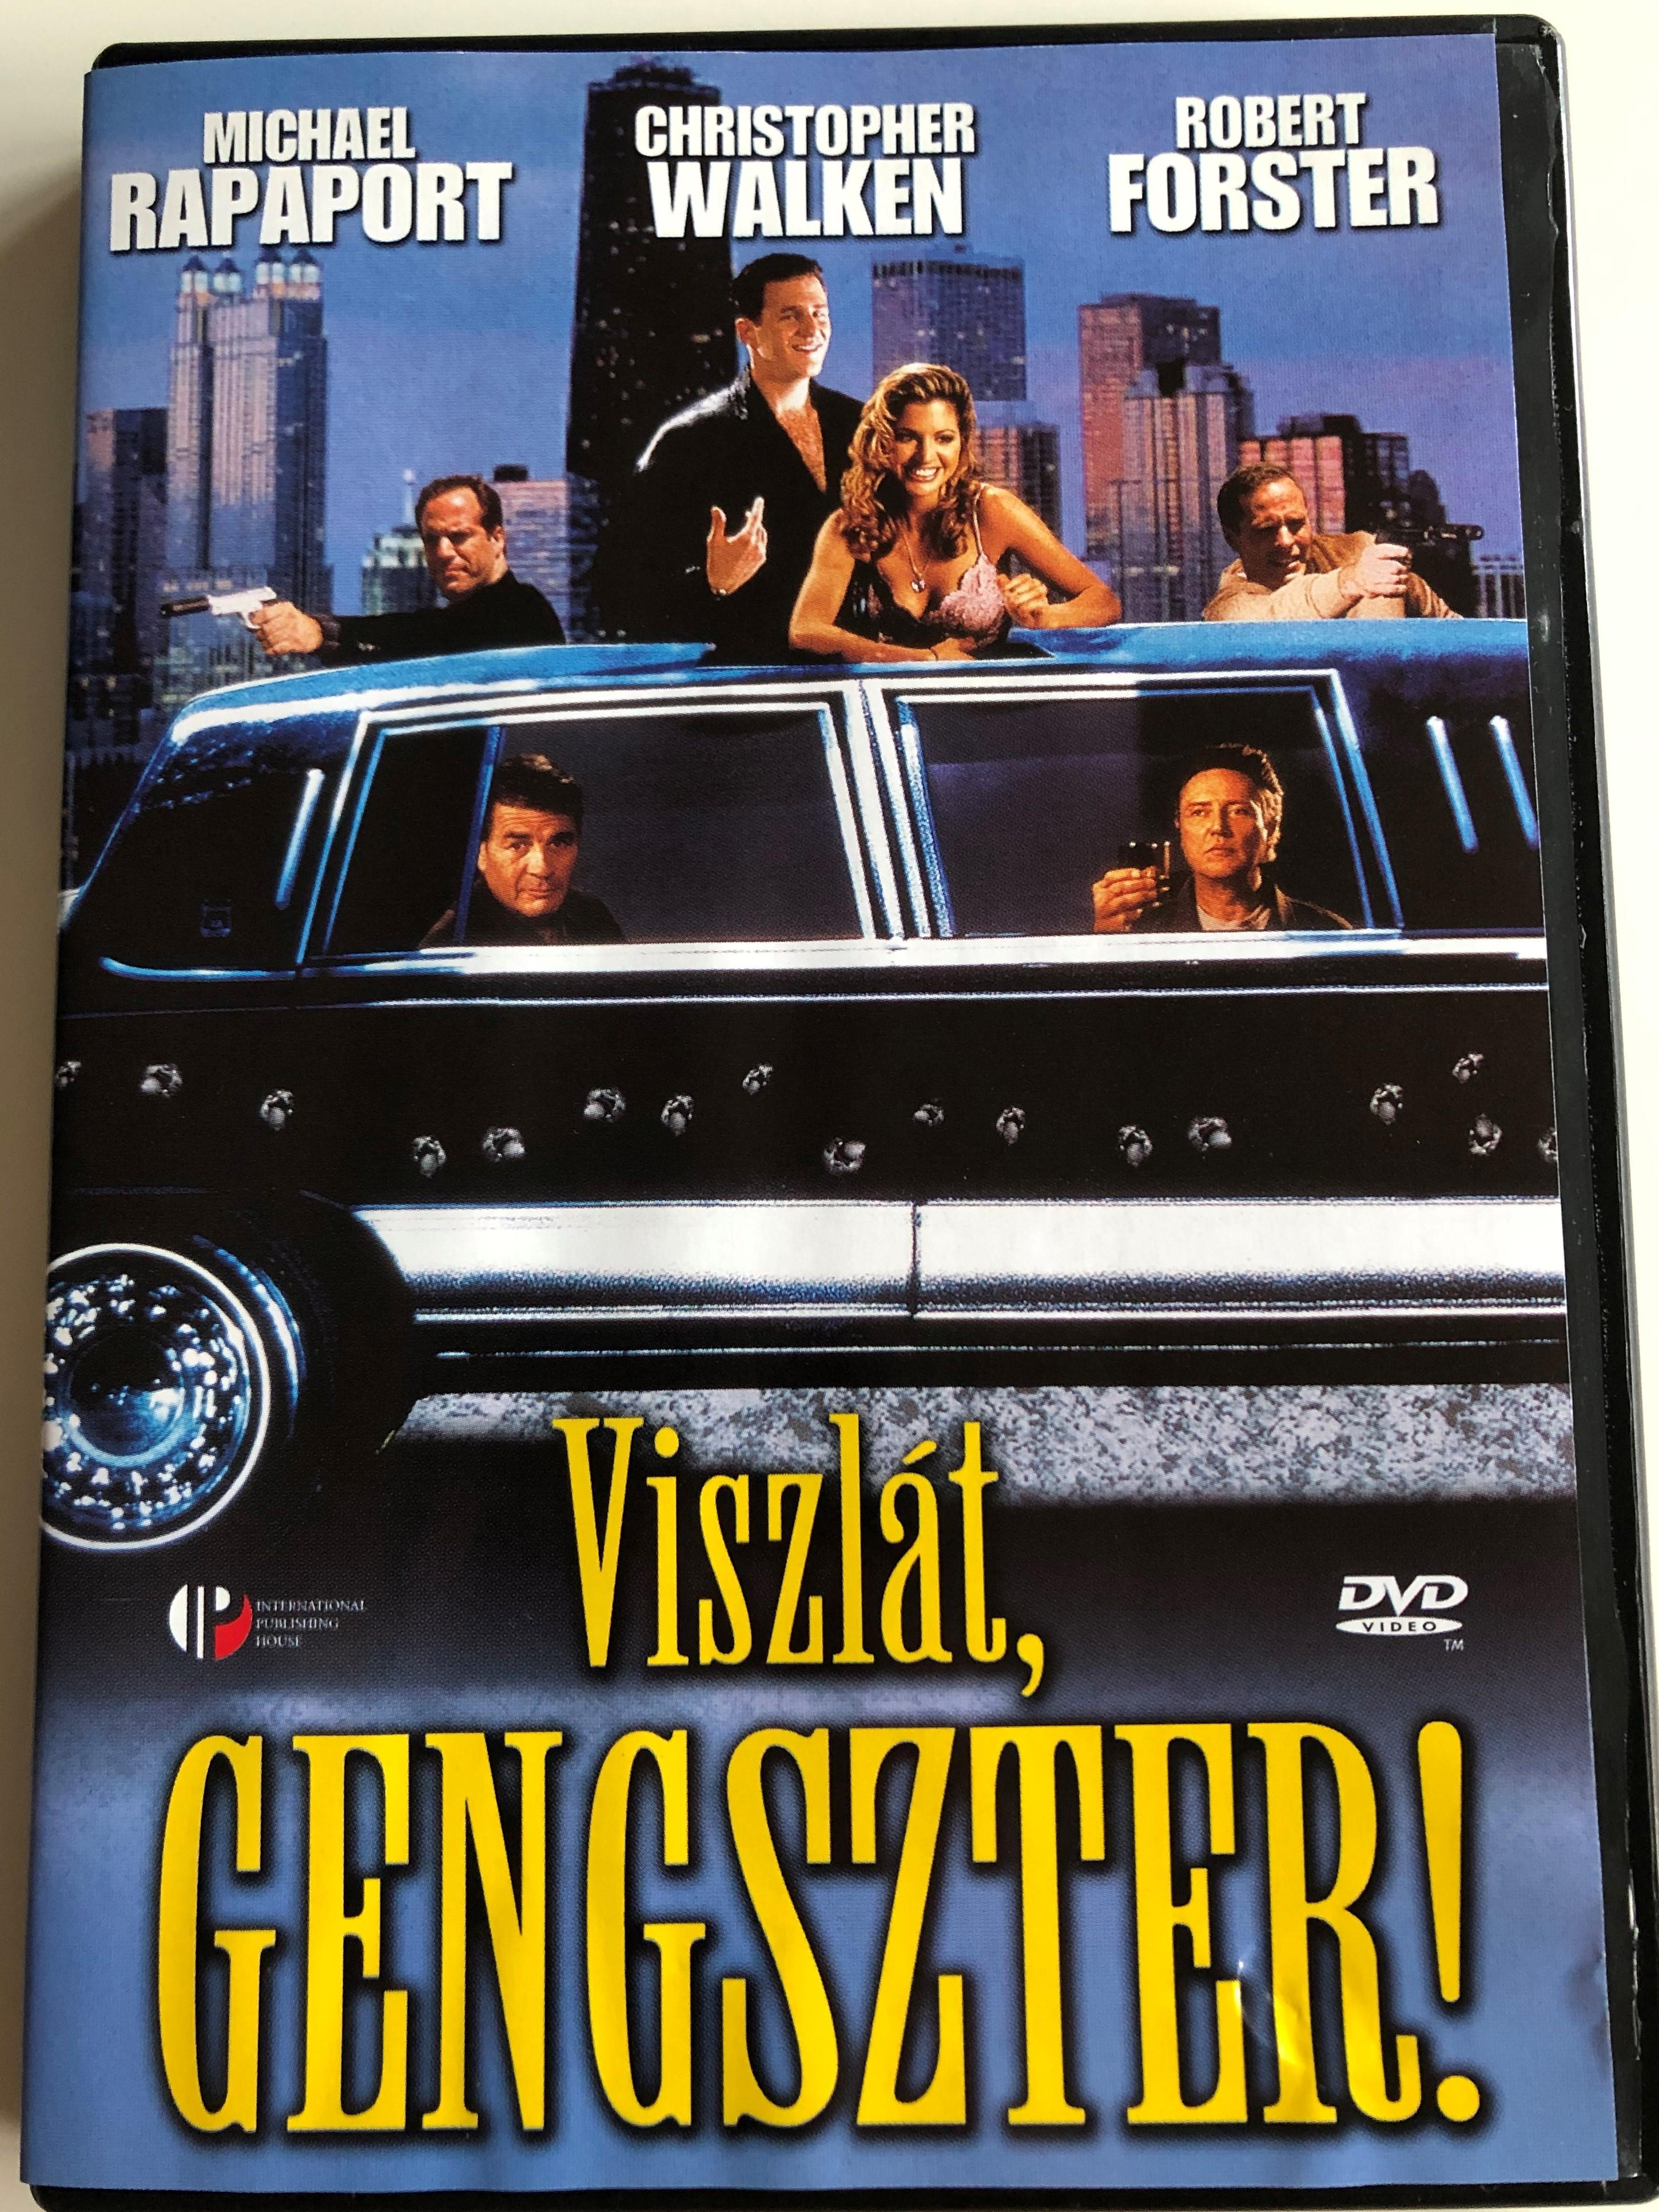 kiss-toledo-goodbye-dvd-1999-viszl-t-gengszter-directed-by-lyndon-chubbuck-starring-michael-rapaport-christopher-walken-christine-taylor-robert-forster-nancy-allen-1-.jpg